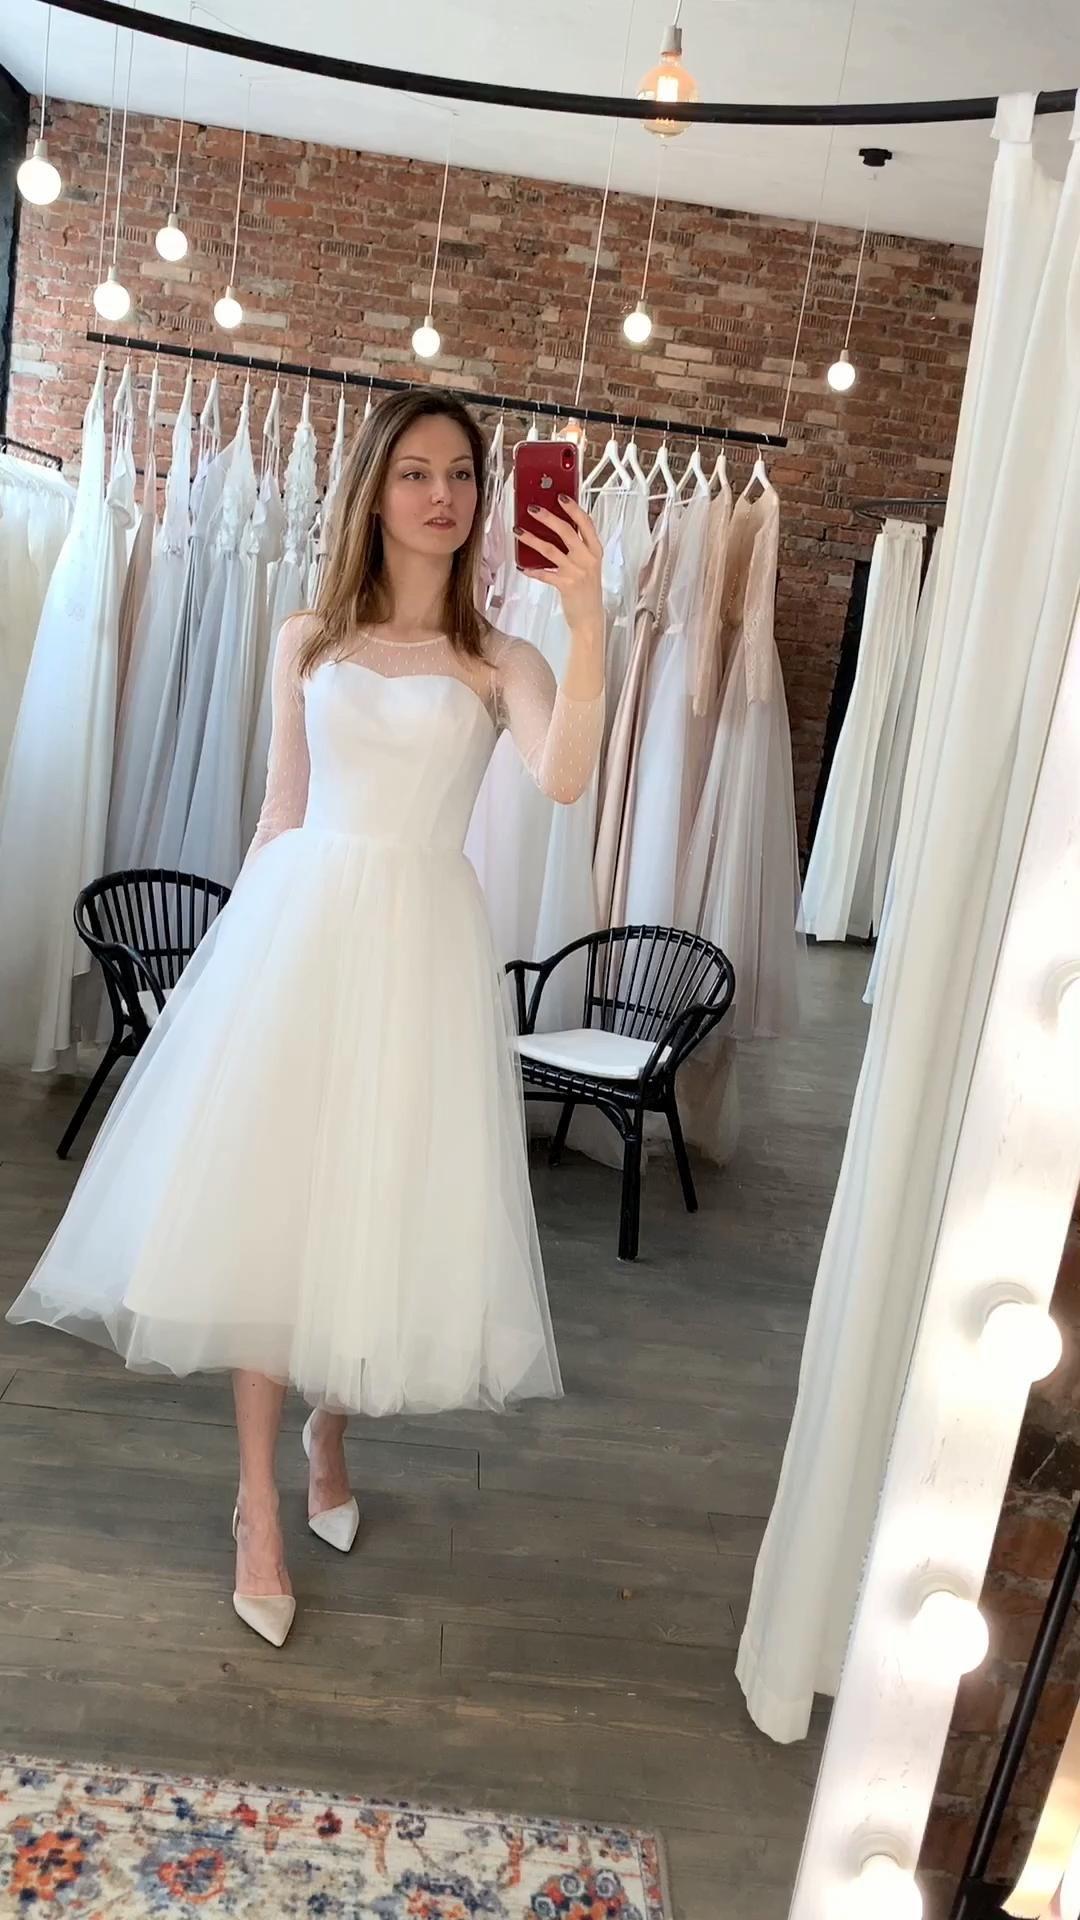 Tea Length Wedding Dress 60s Wedding Dress Simple Wedding Etsy Video Video Short Wedding Dress Wedding Dresses 60s Tea Length Wedding Dress [ 1920 x 1080 Pixel ]